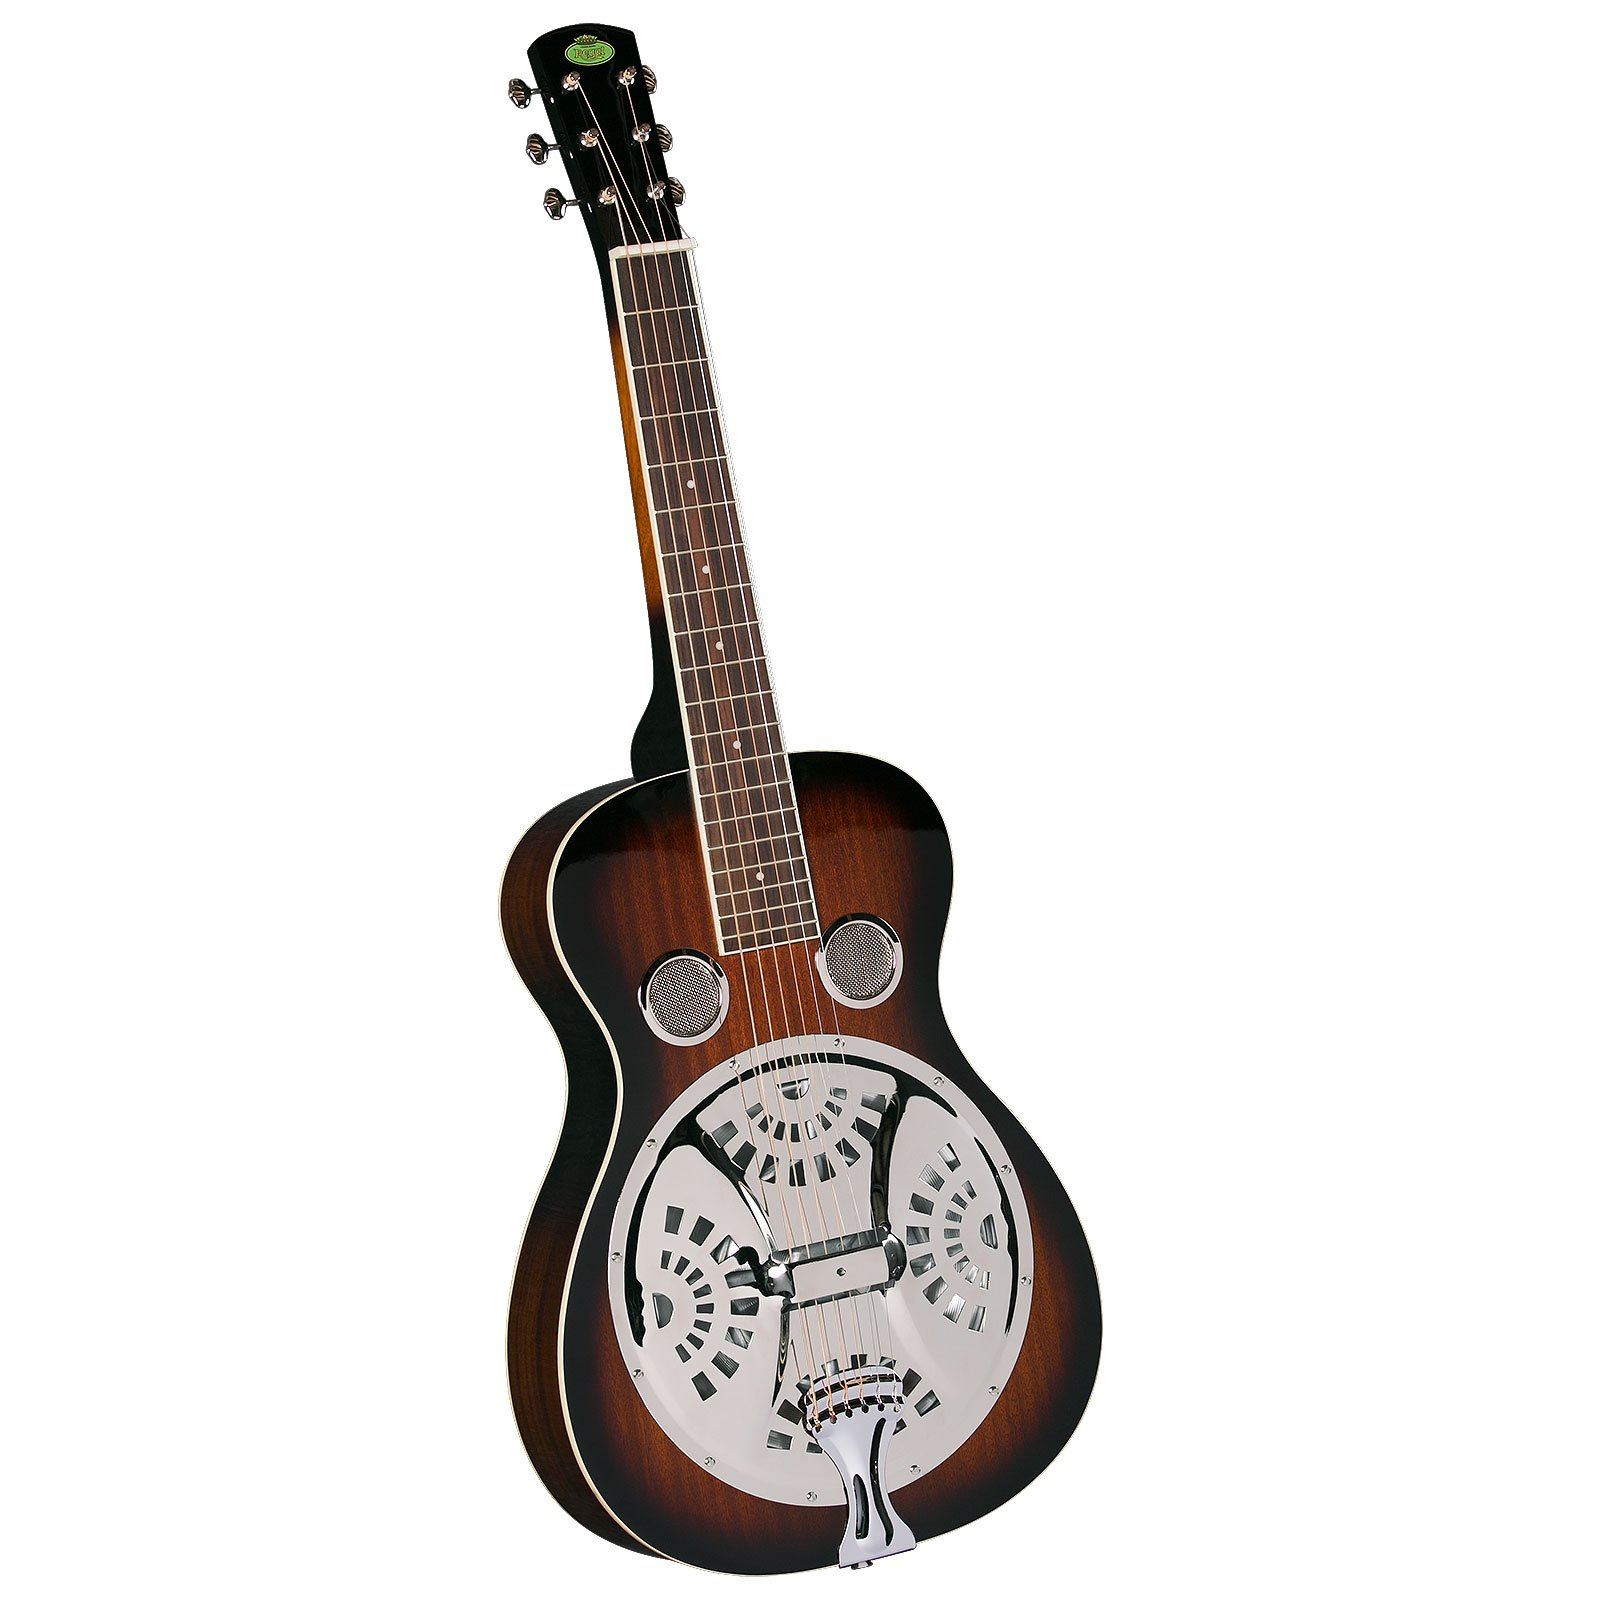 Regal RD-30TS Studio Series Squareneck Resophonic Guitar - Sunburst Mahogany by Regal Resophonic Guitars